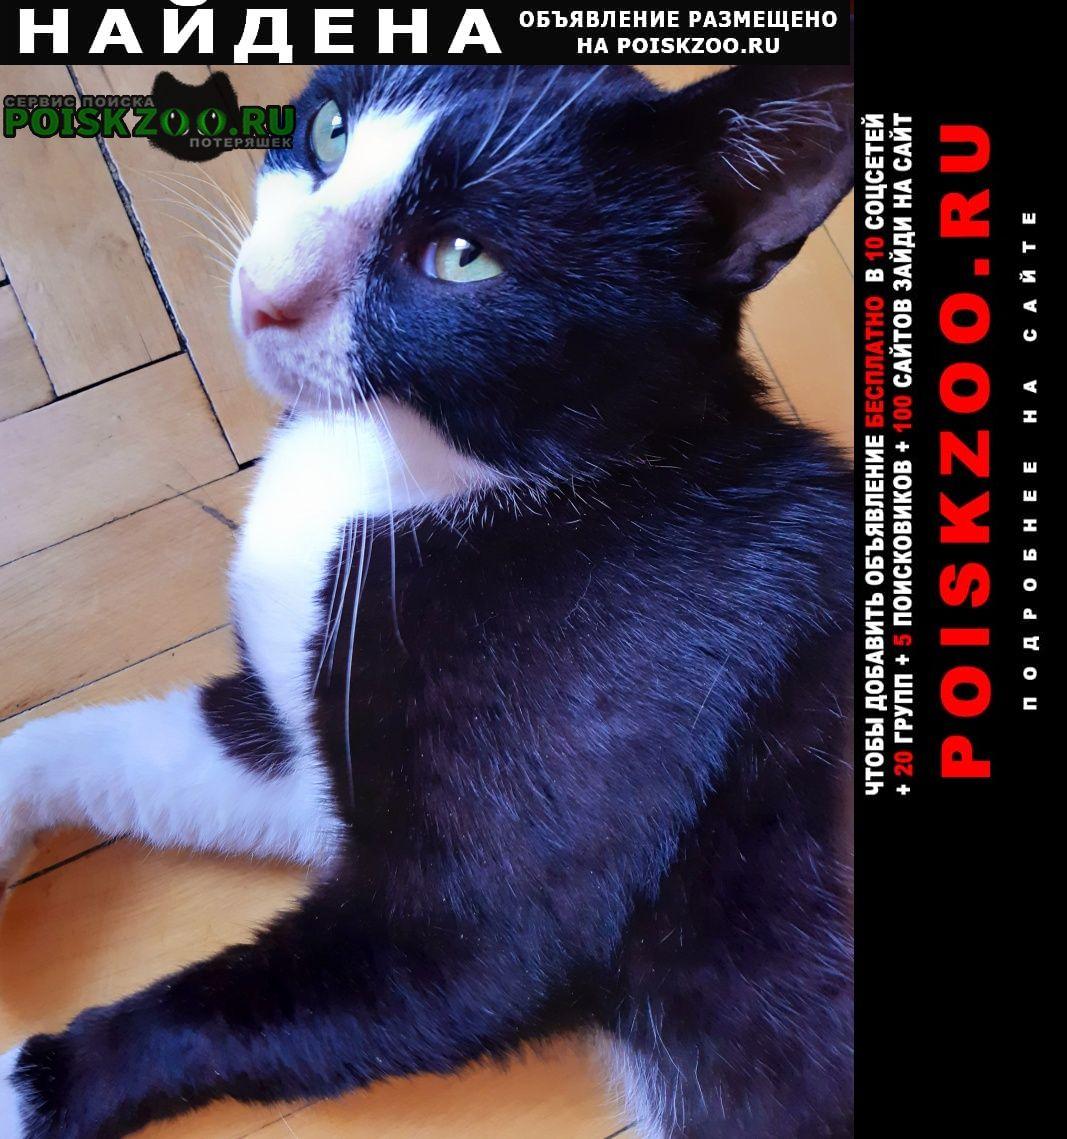 Найдена кошка потеряшка Москва